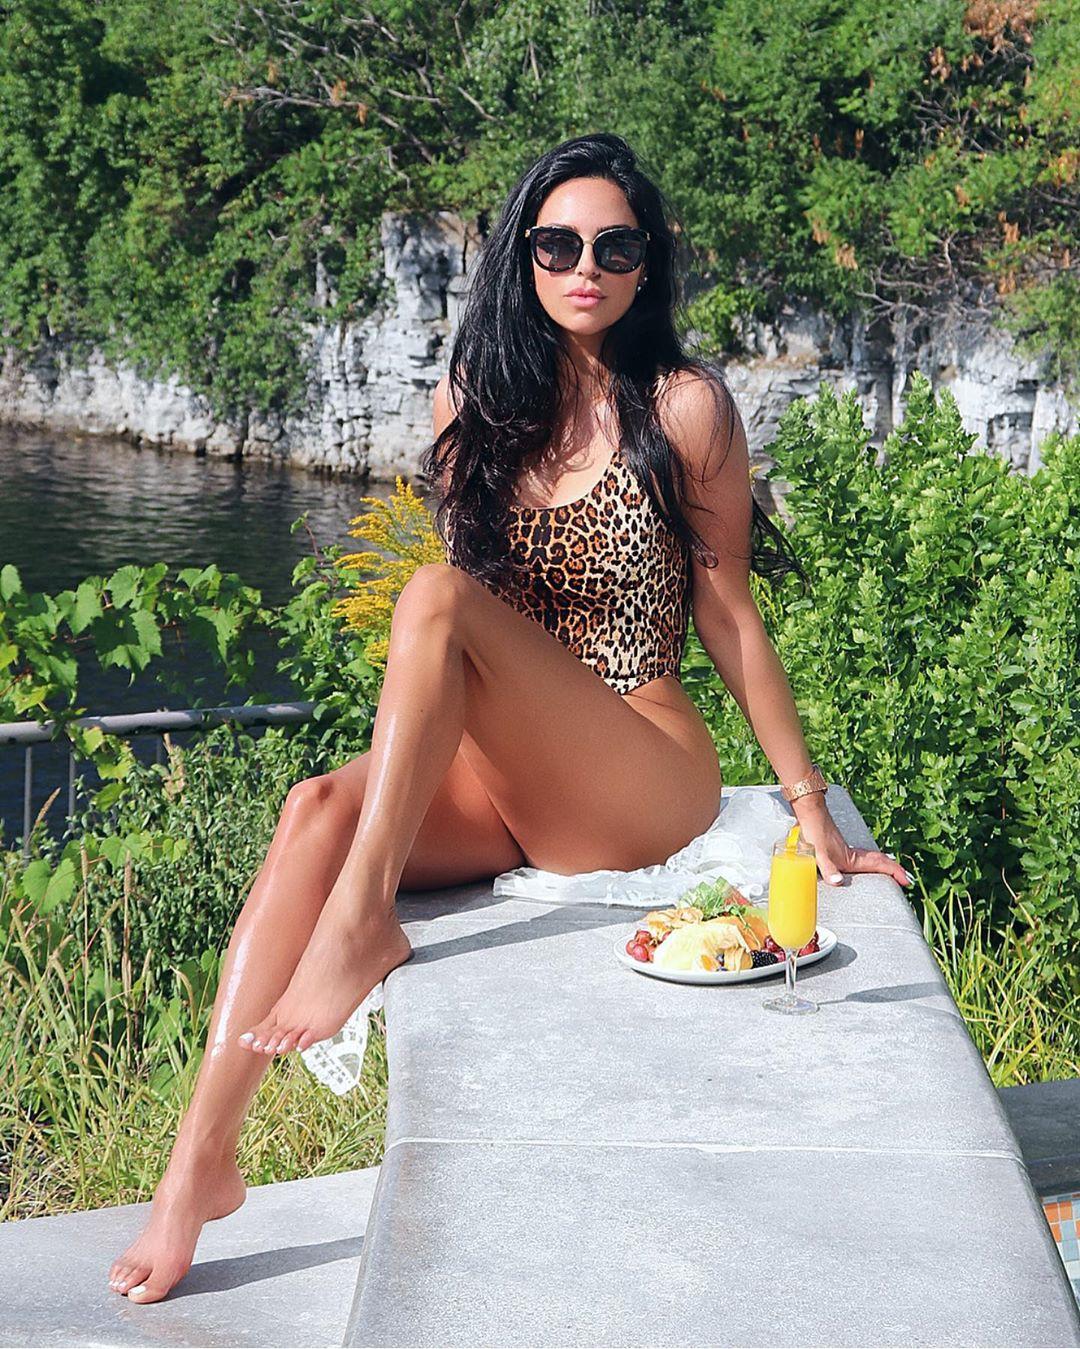 Shadi Y Cair bikini bodies swimwear clothing ideas, hot legs picture